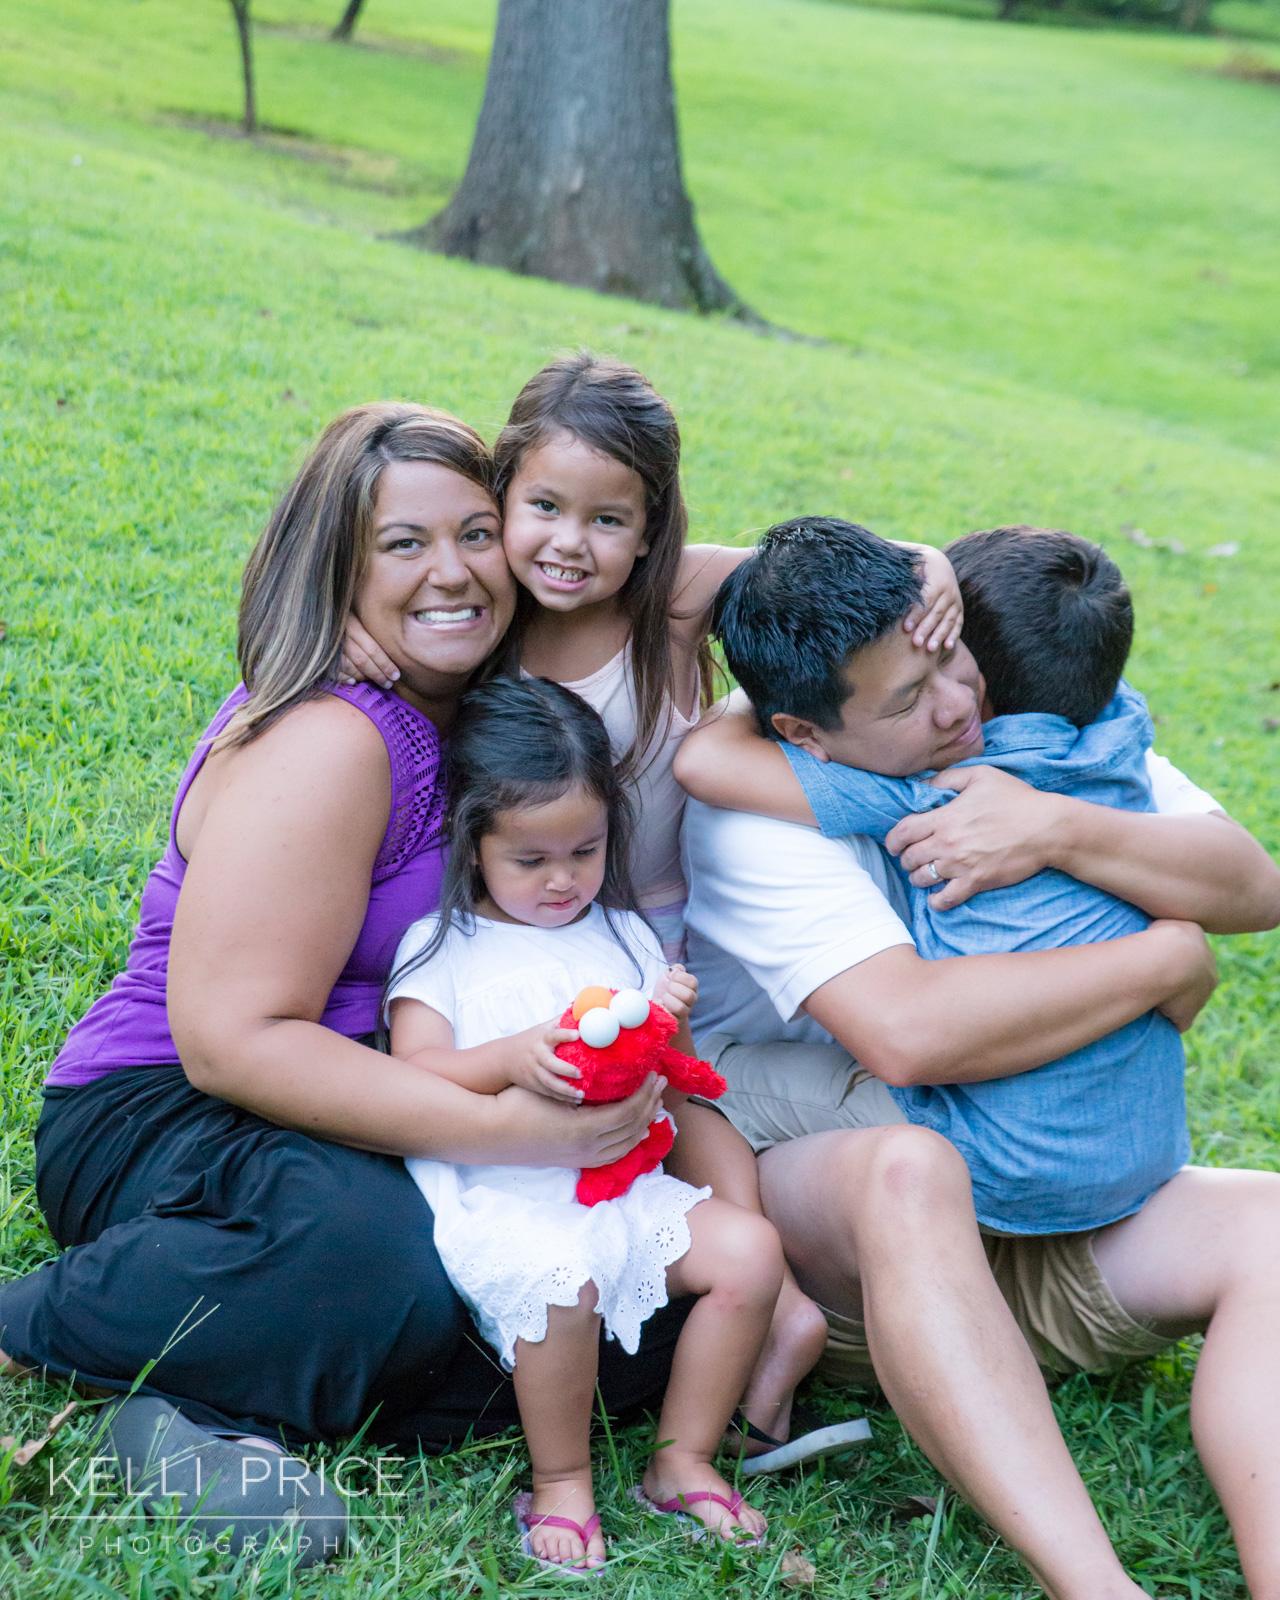 Fun Family Portraits by a Professional Photographer, Atlanta, Georia